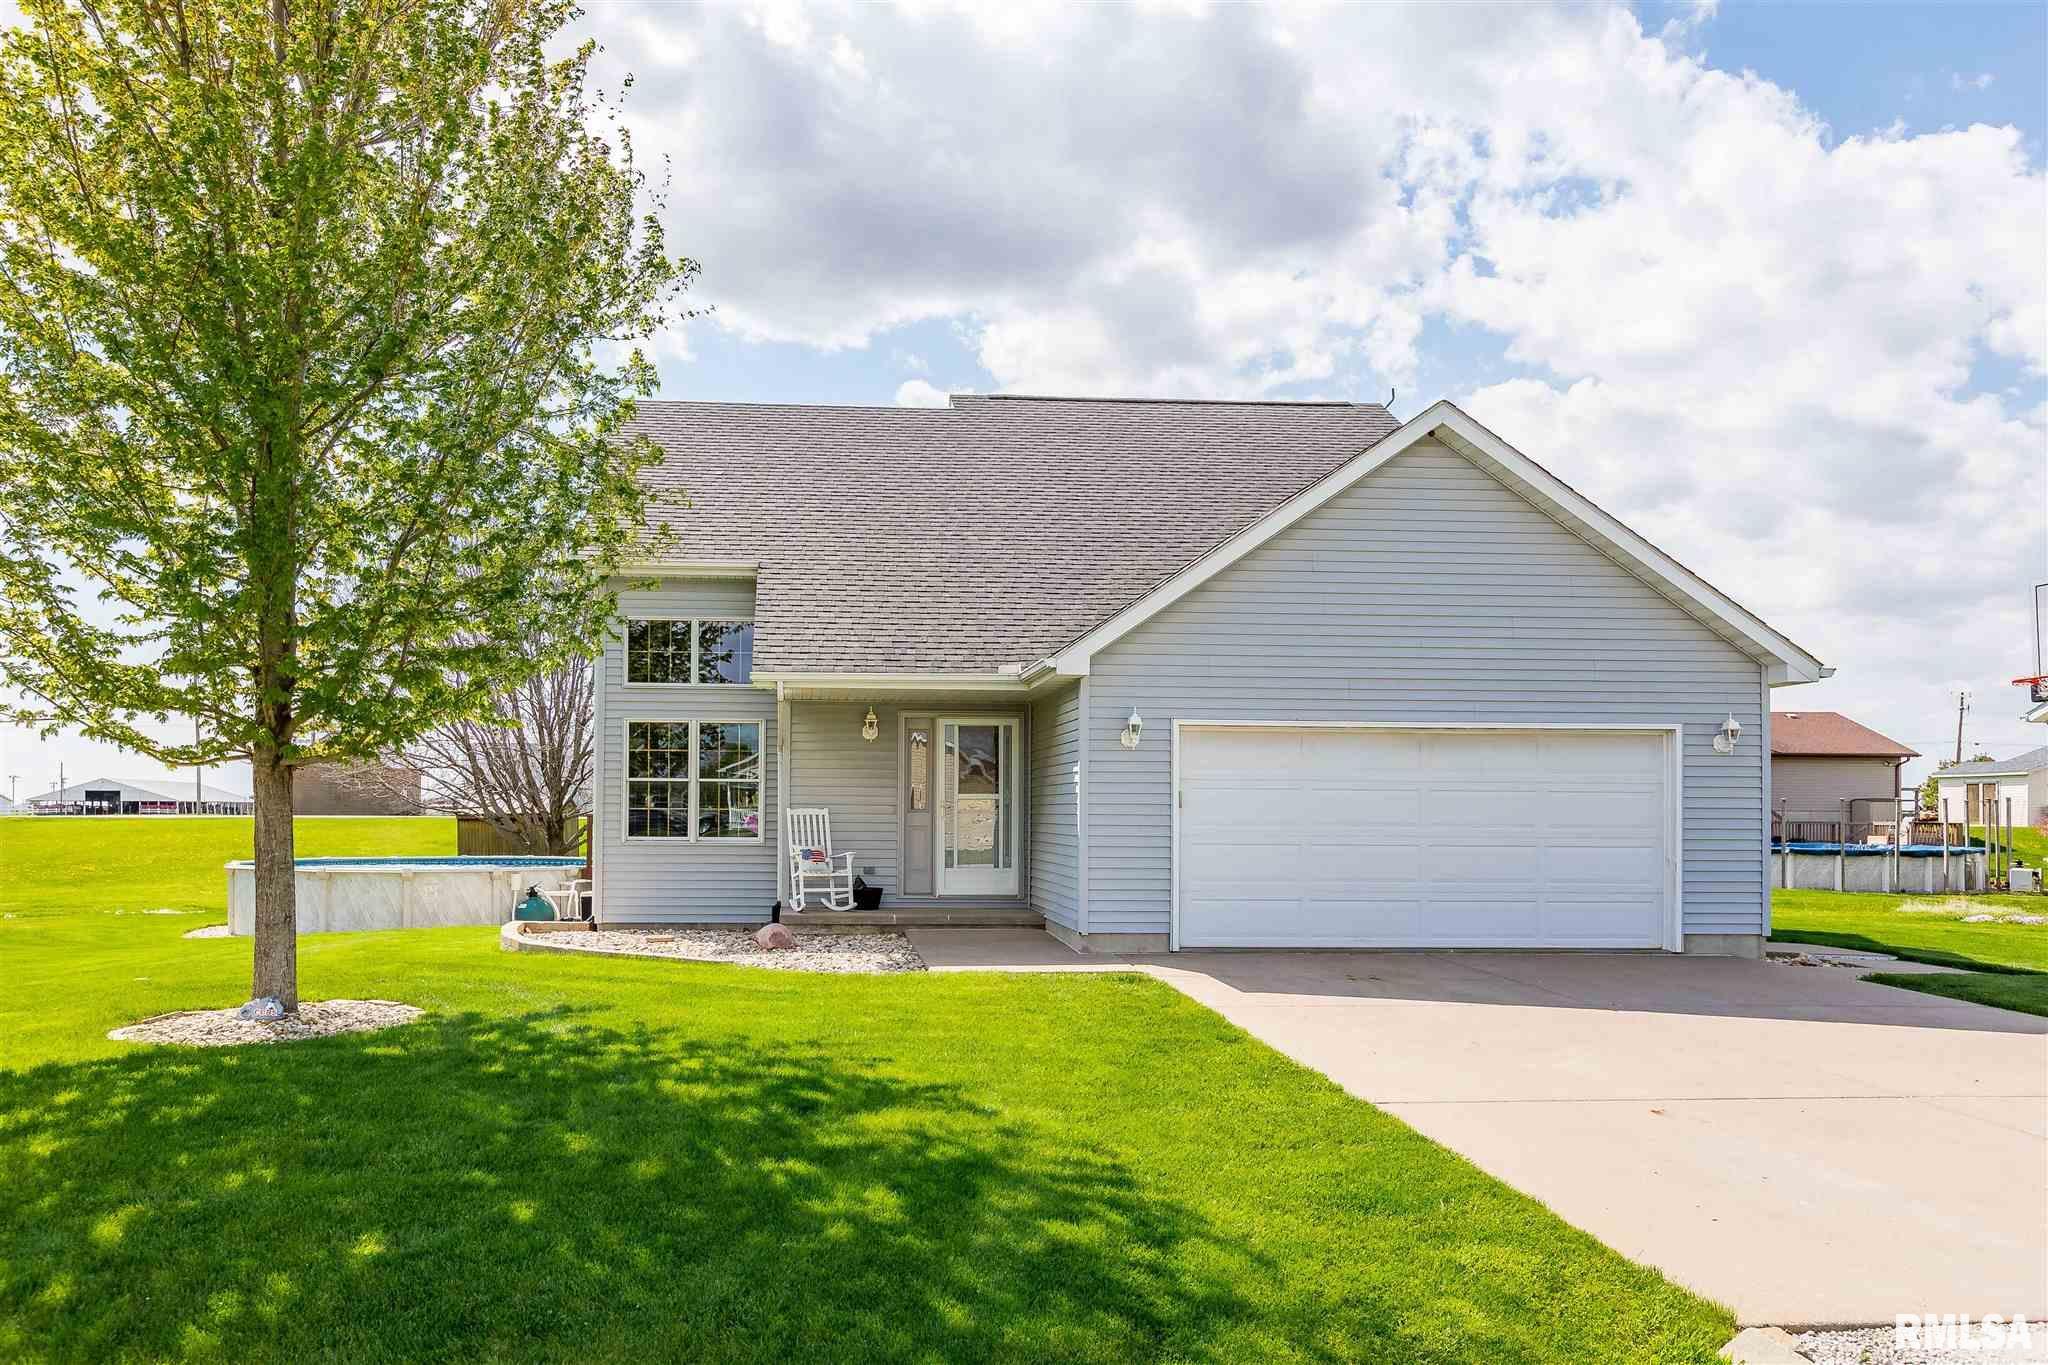 909 SW 11TH Property Photo - Aledo, IL real estate listing